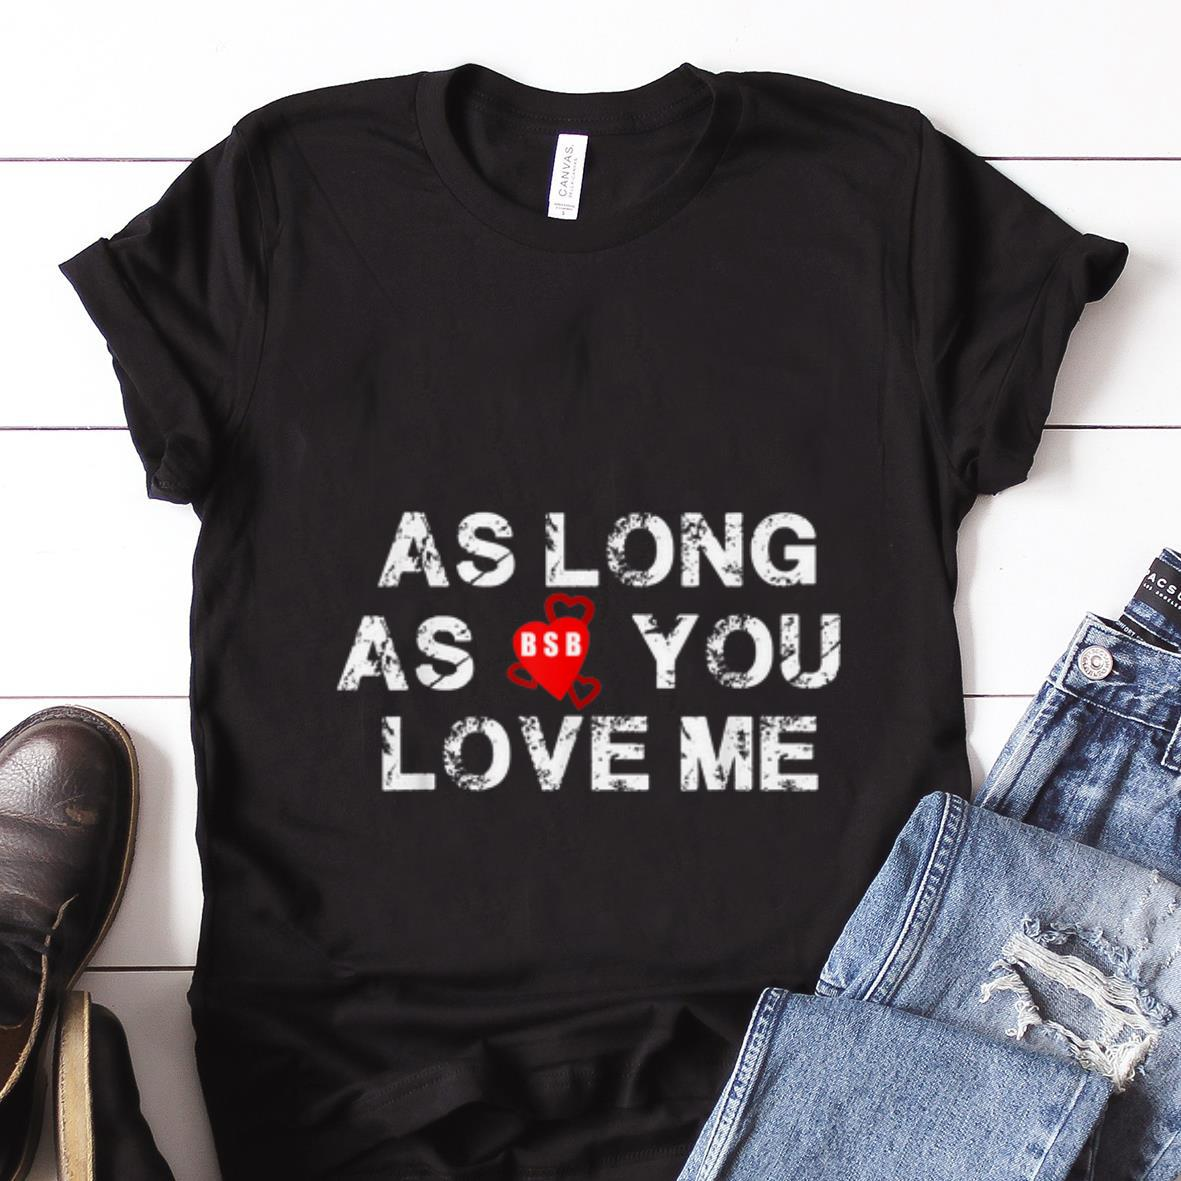 Backstreet Boys Christmas Sweater.Best Price Backstreet Boys Back Again As Long As You Love Me Shirt